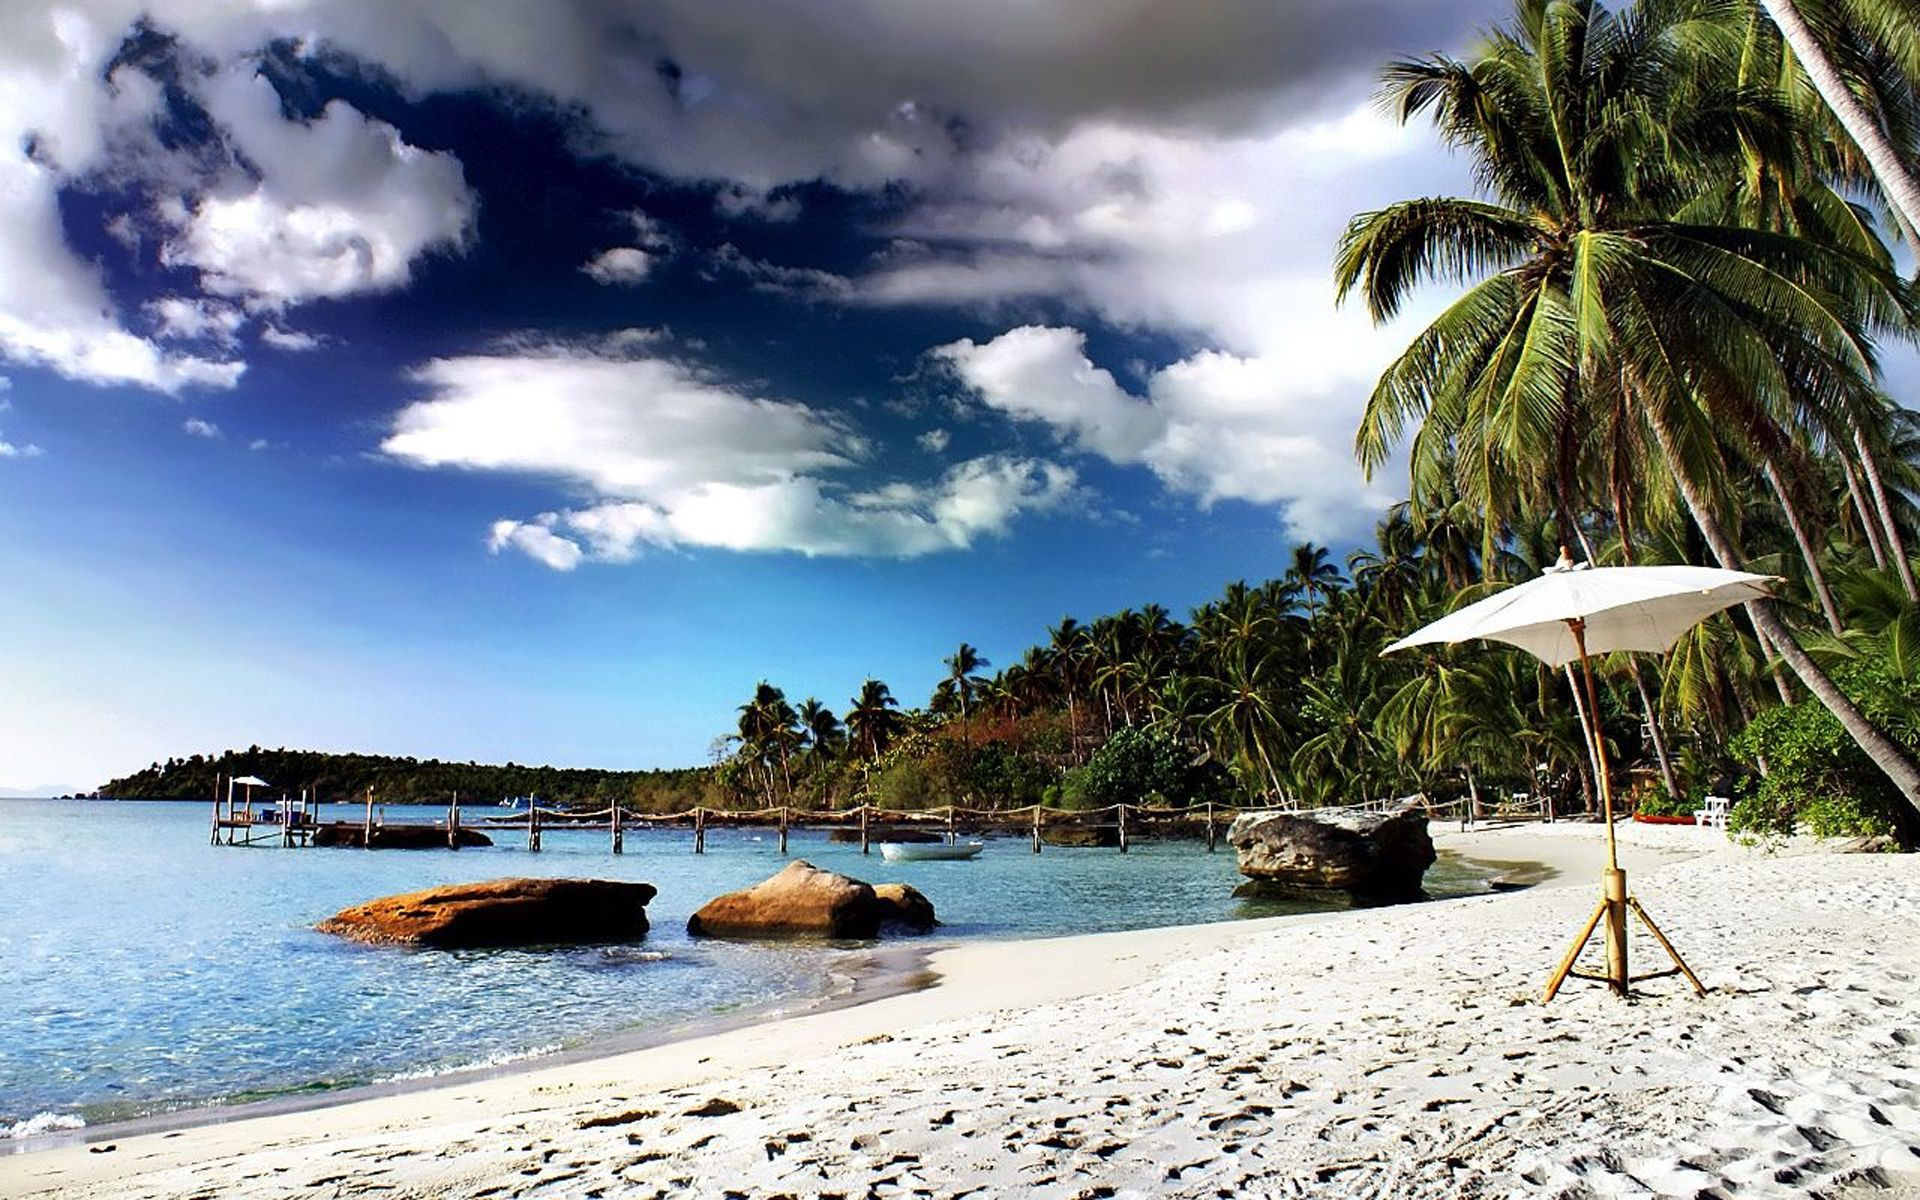 Big world   thailand sandy beach in the resort of cha am  thailand 061816